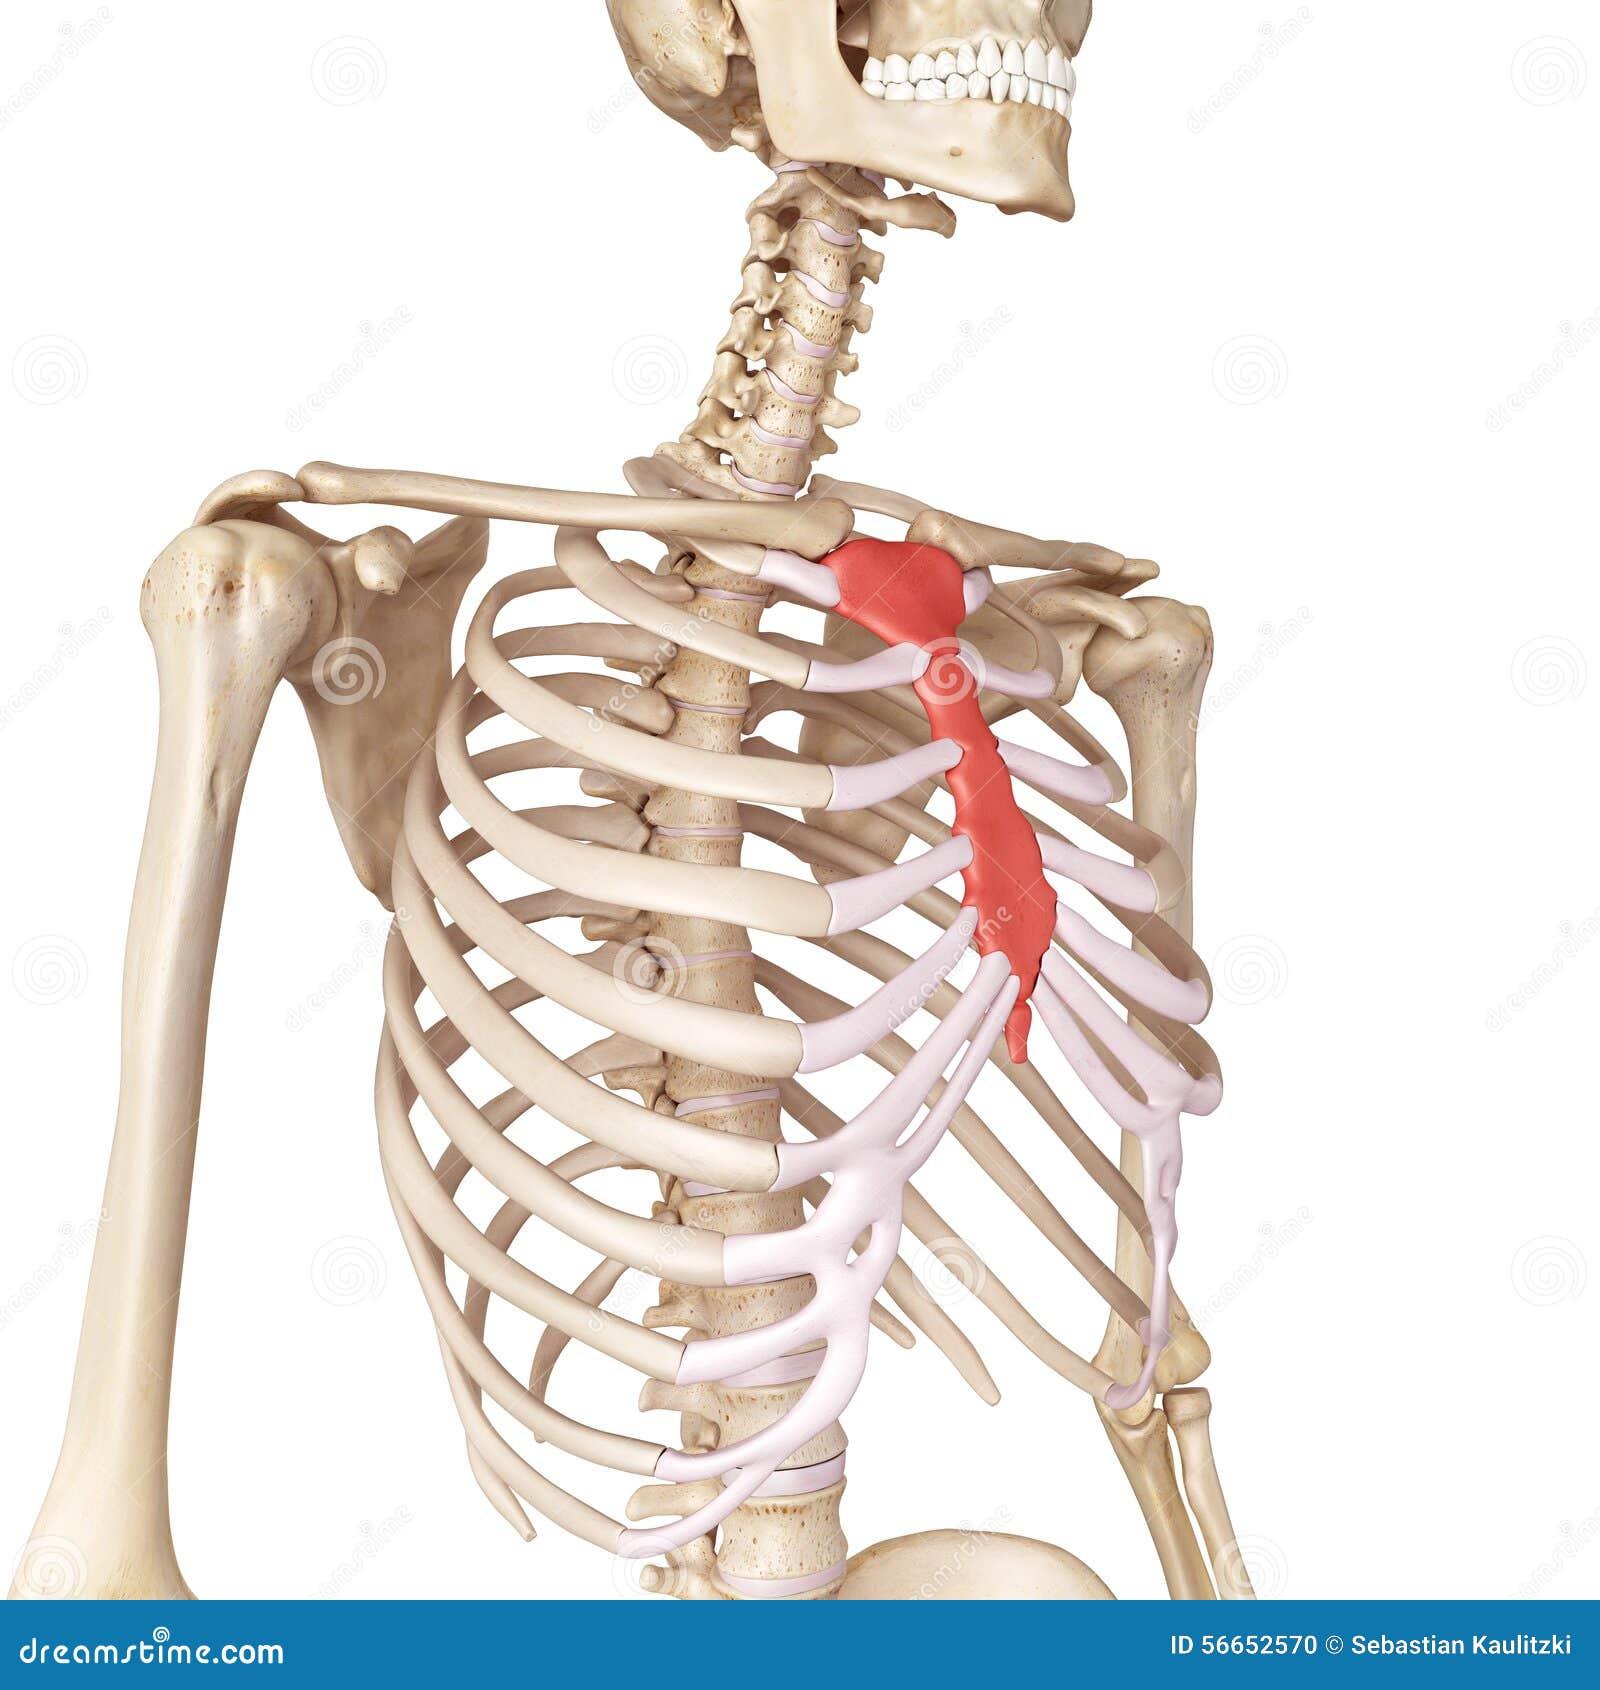 the breast bone stock illustration - image: 56652570, Cephalic Vein